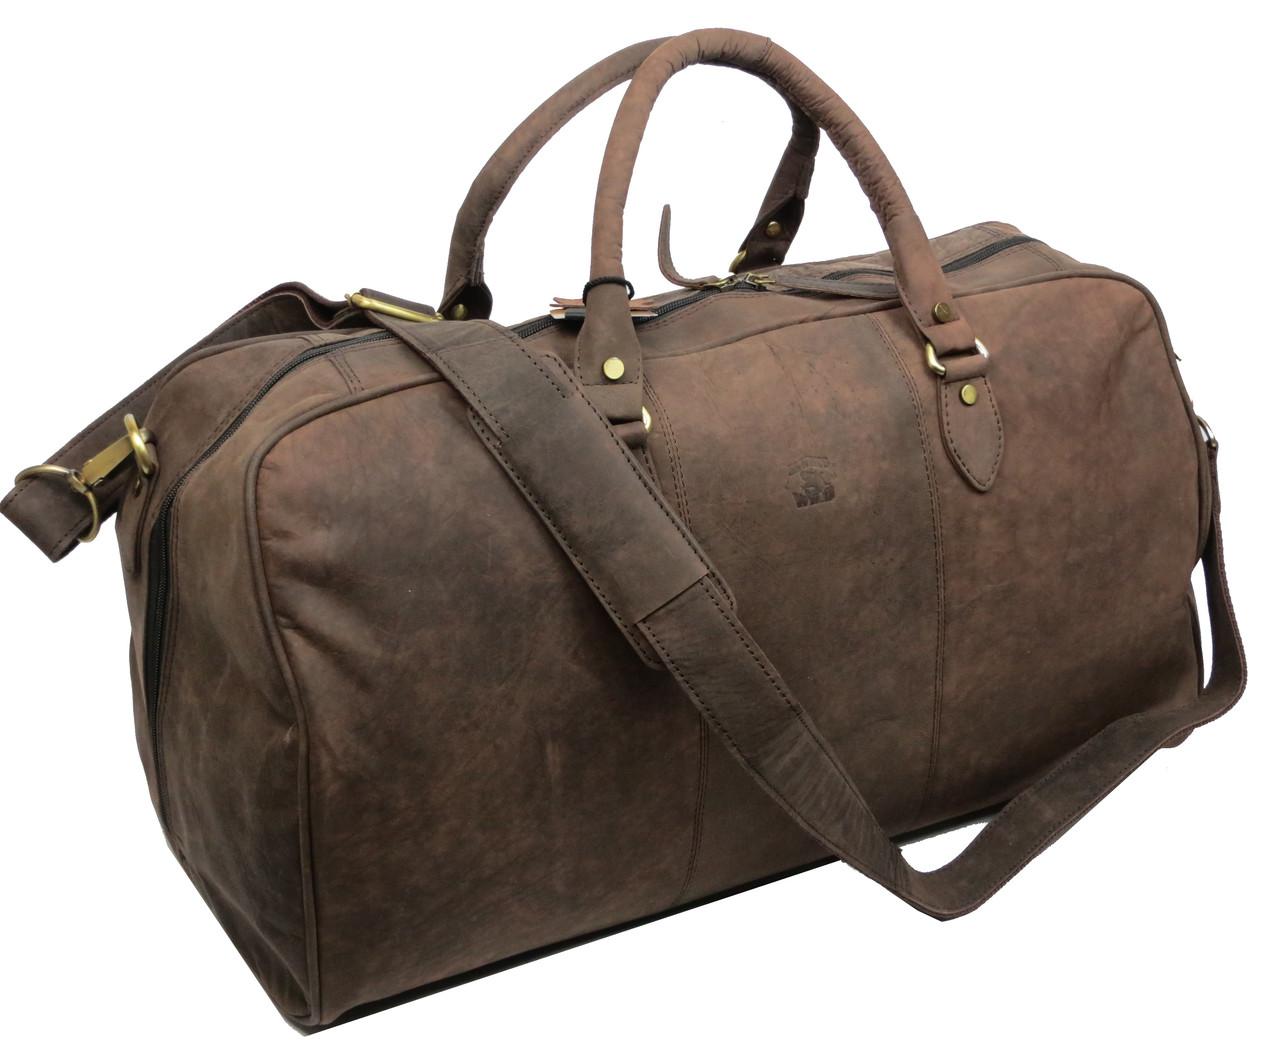 Дорожная кожаная сумка, саквояж 33 л Always Wild C20.004 brown